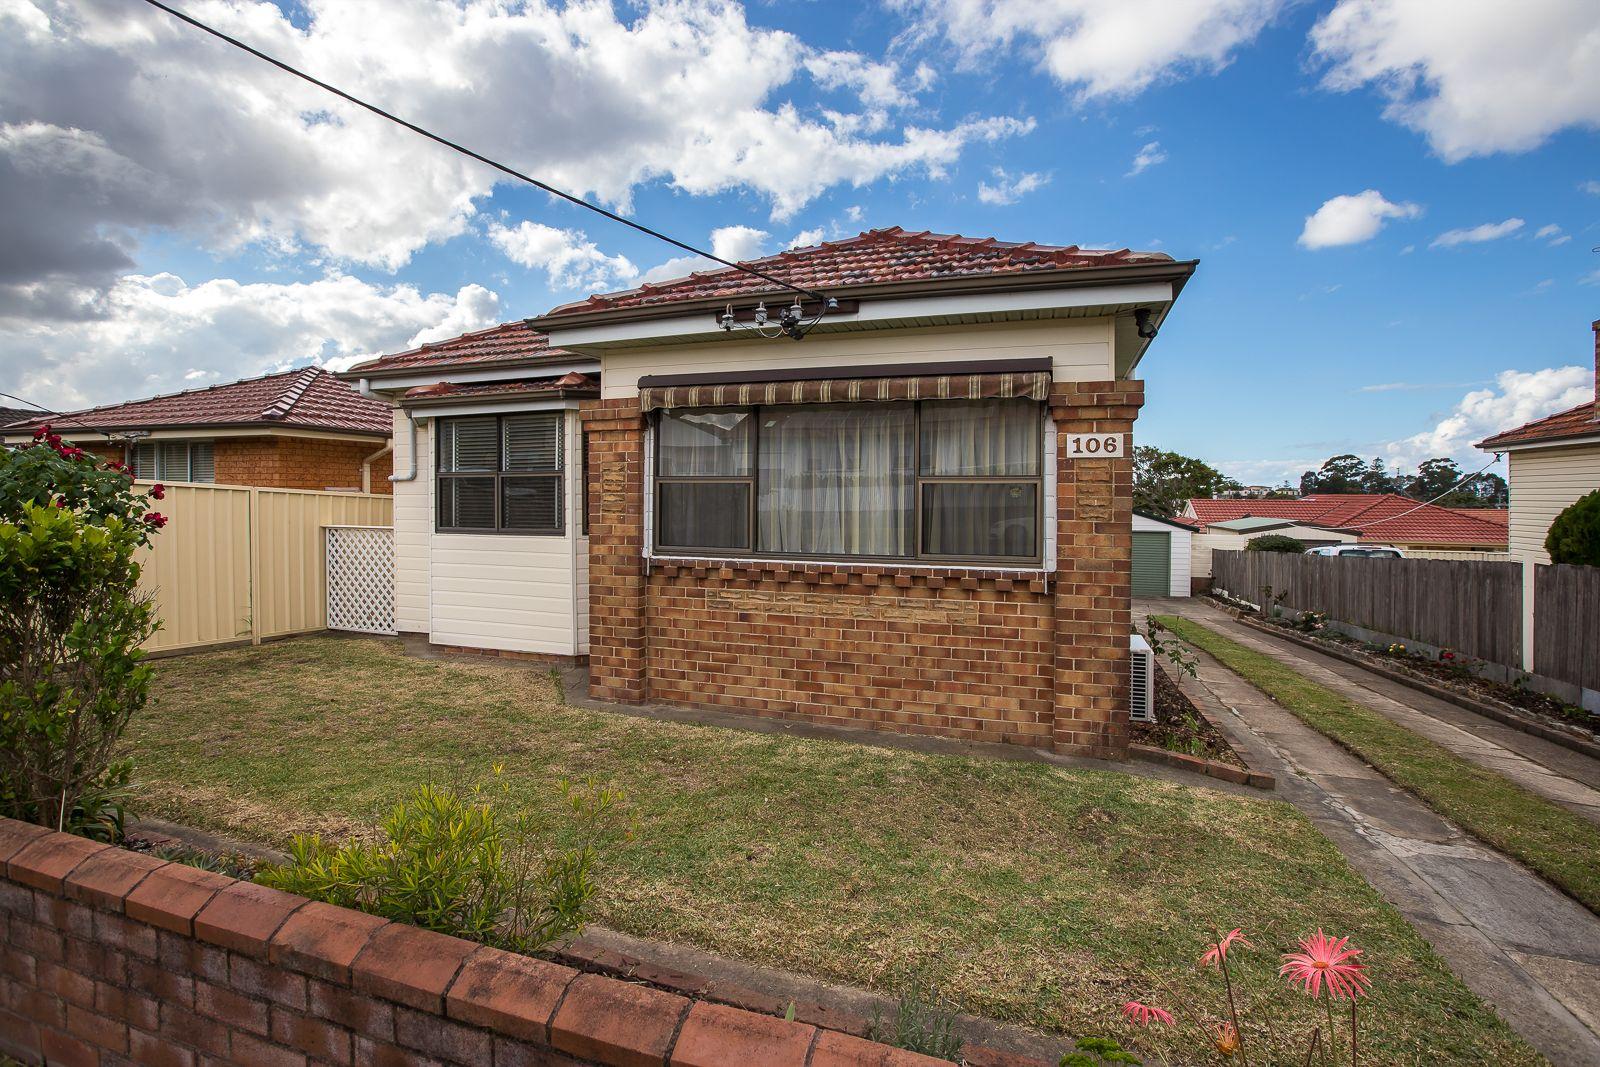 106 Young Road, Lambton NSW 2299, Image 0